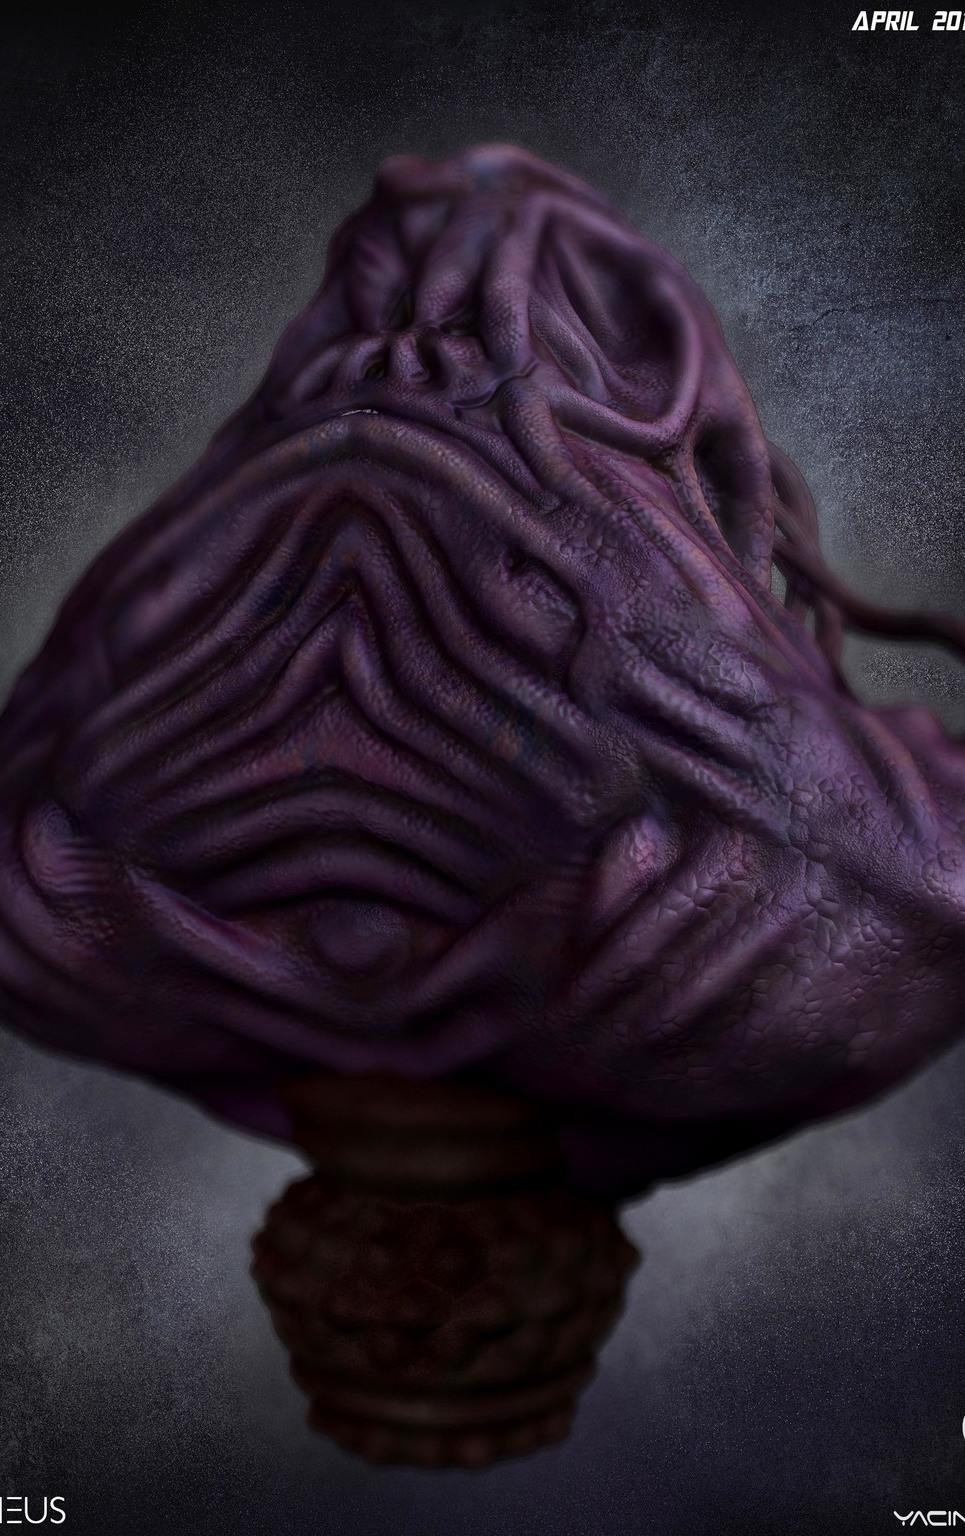 04 final render alien prometheus by yacine brinis show